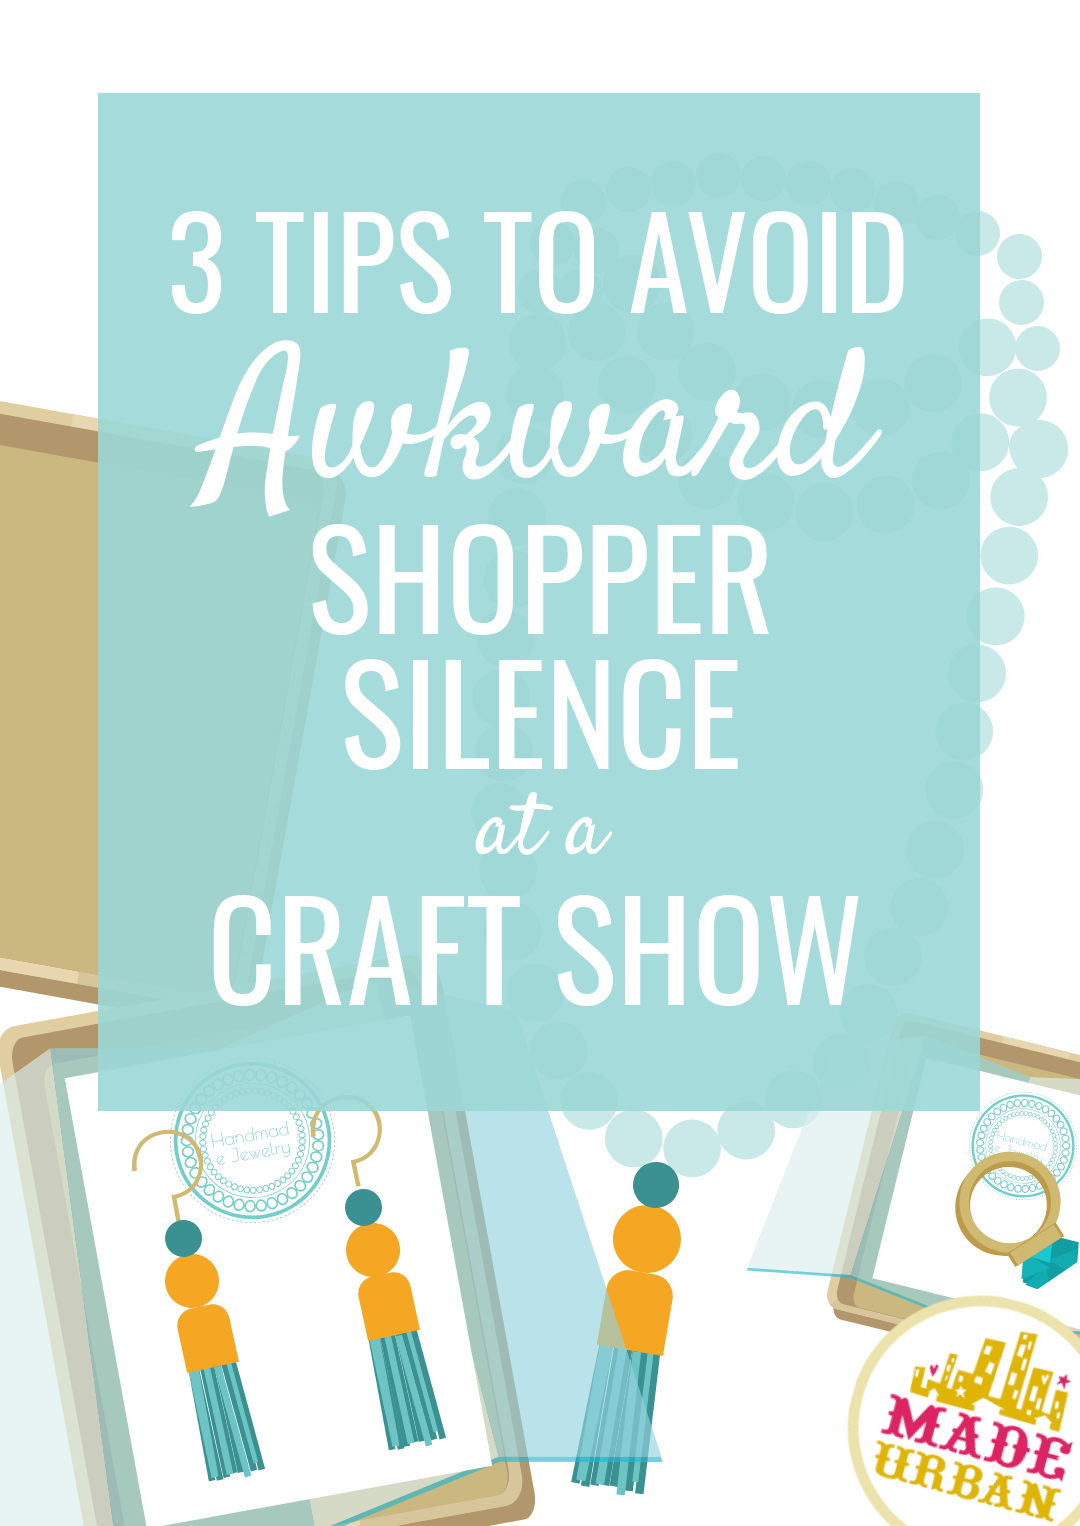 3 Tips to Avoid Awkward Shopper Silence at a Craft Show - Made Urban